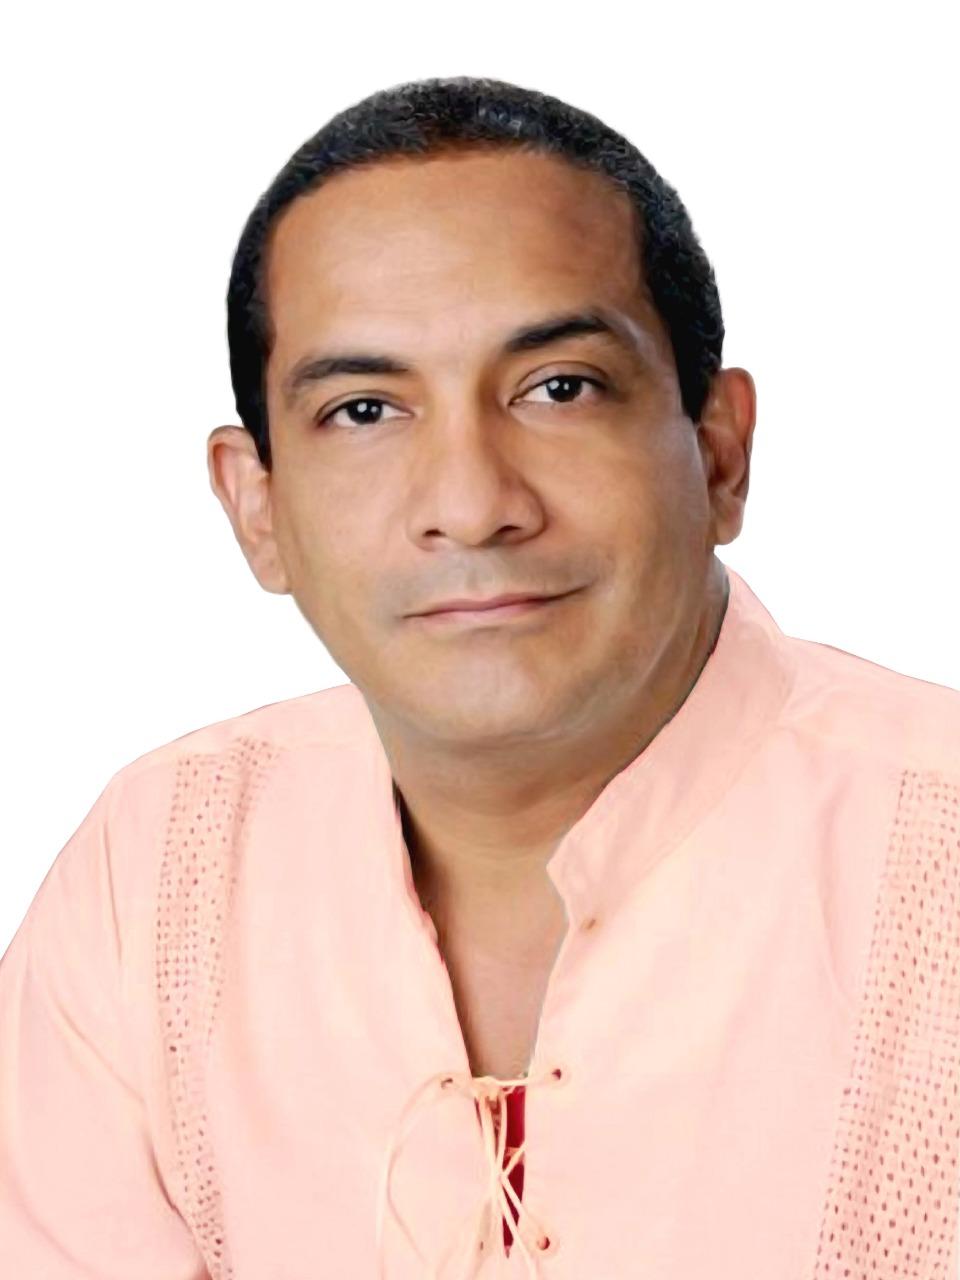 Rafa Manjarrez  rinde homenaje al maestro Rafael Escalona